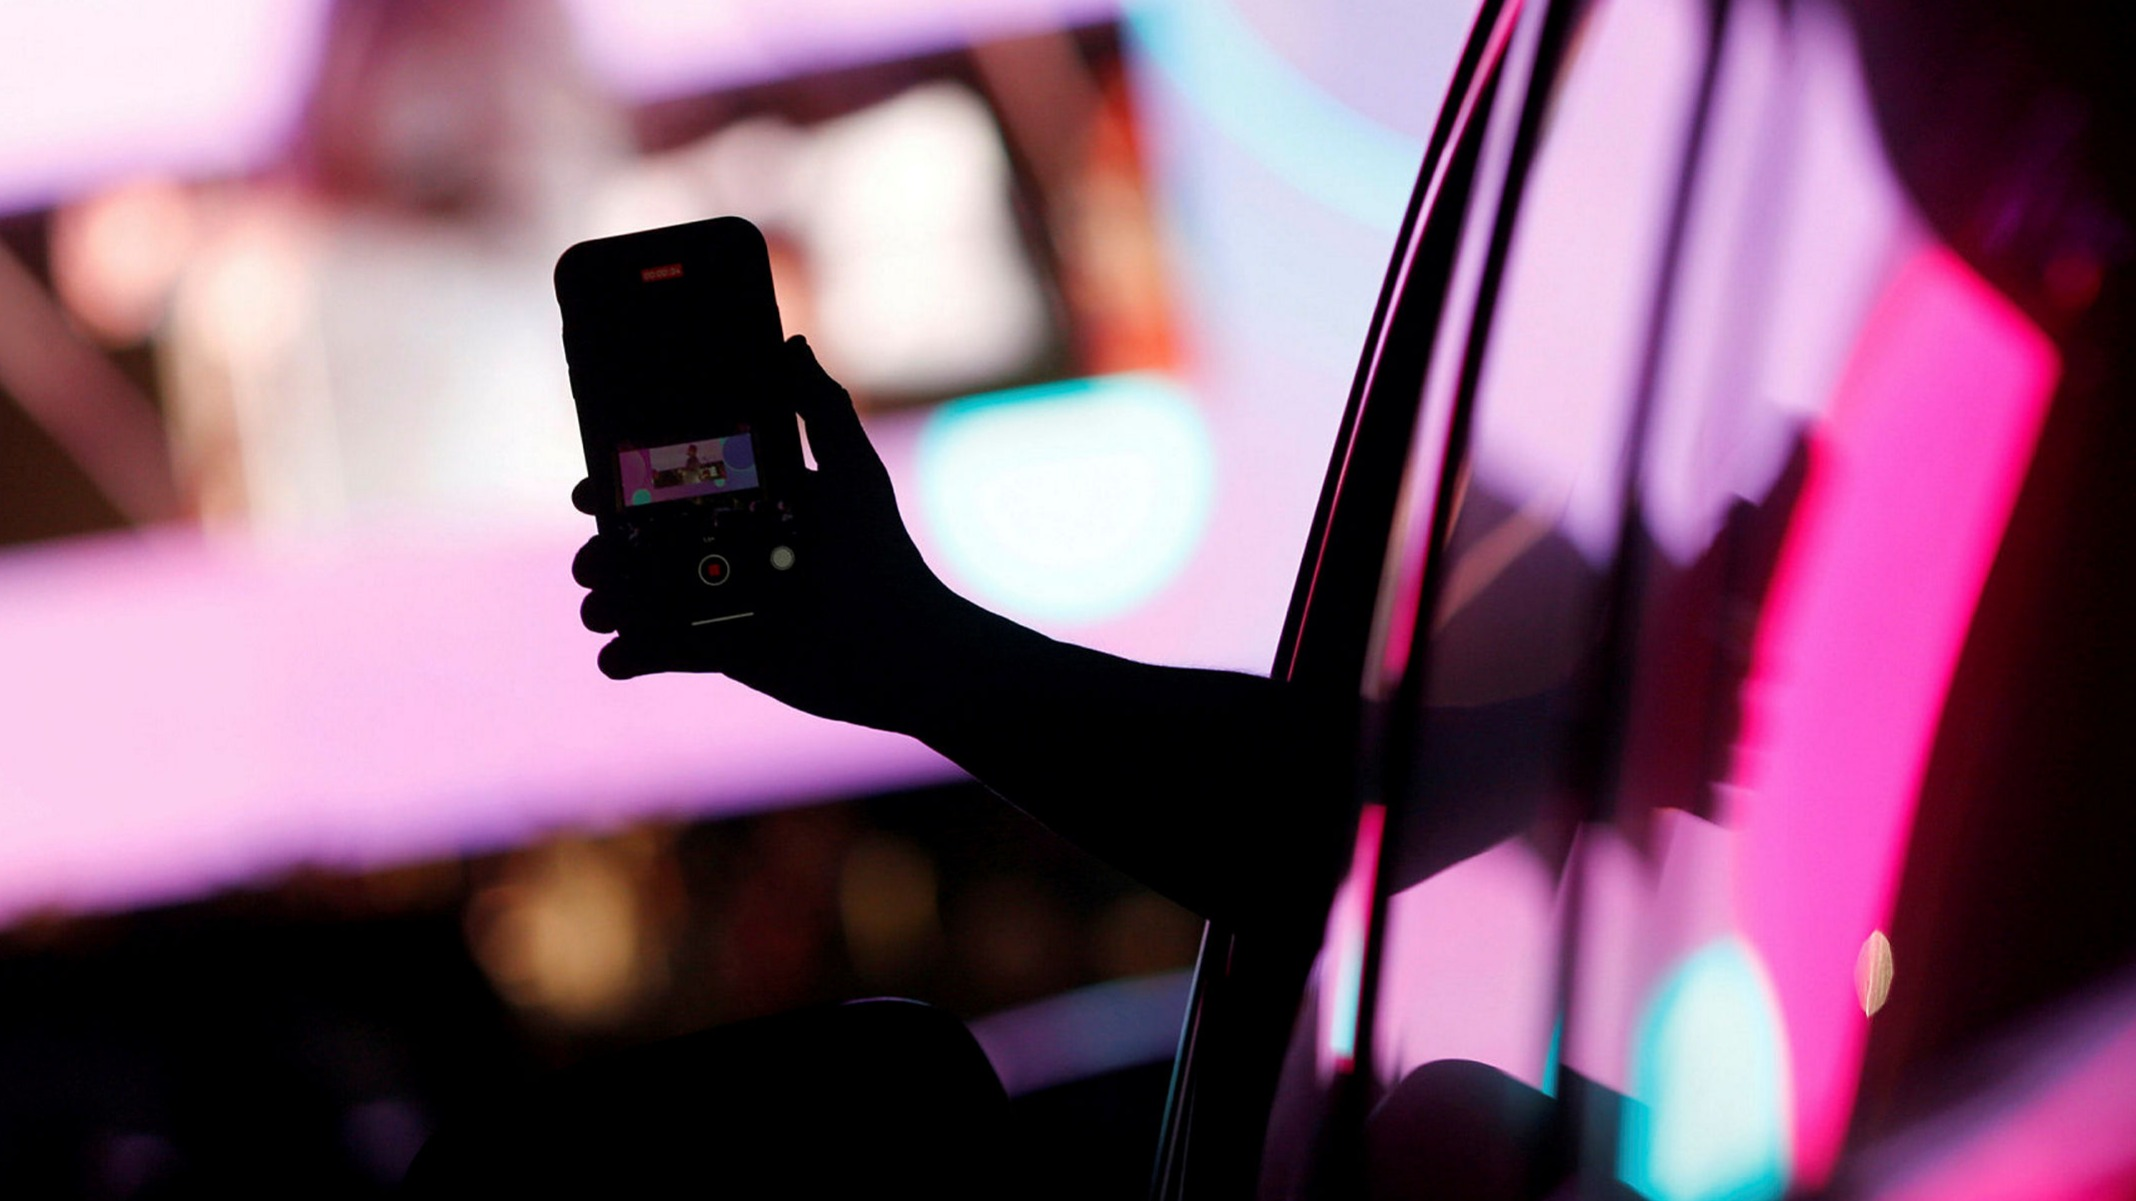 'Stalkerware' spy apps on smartphones rises